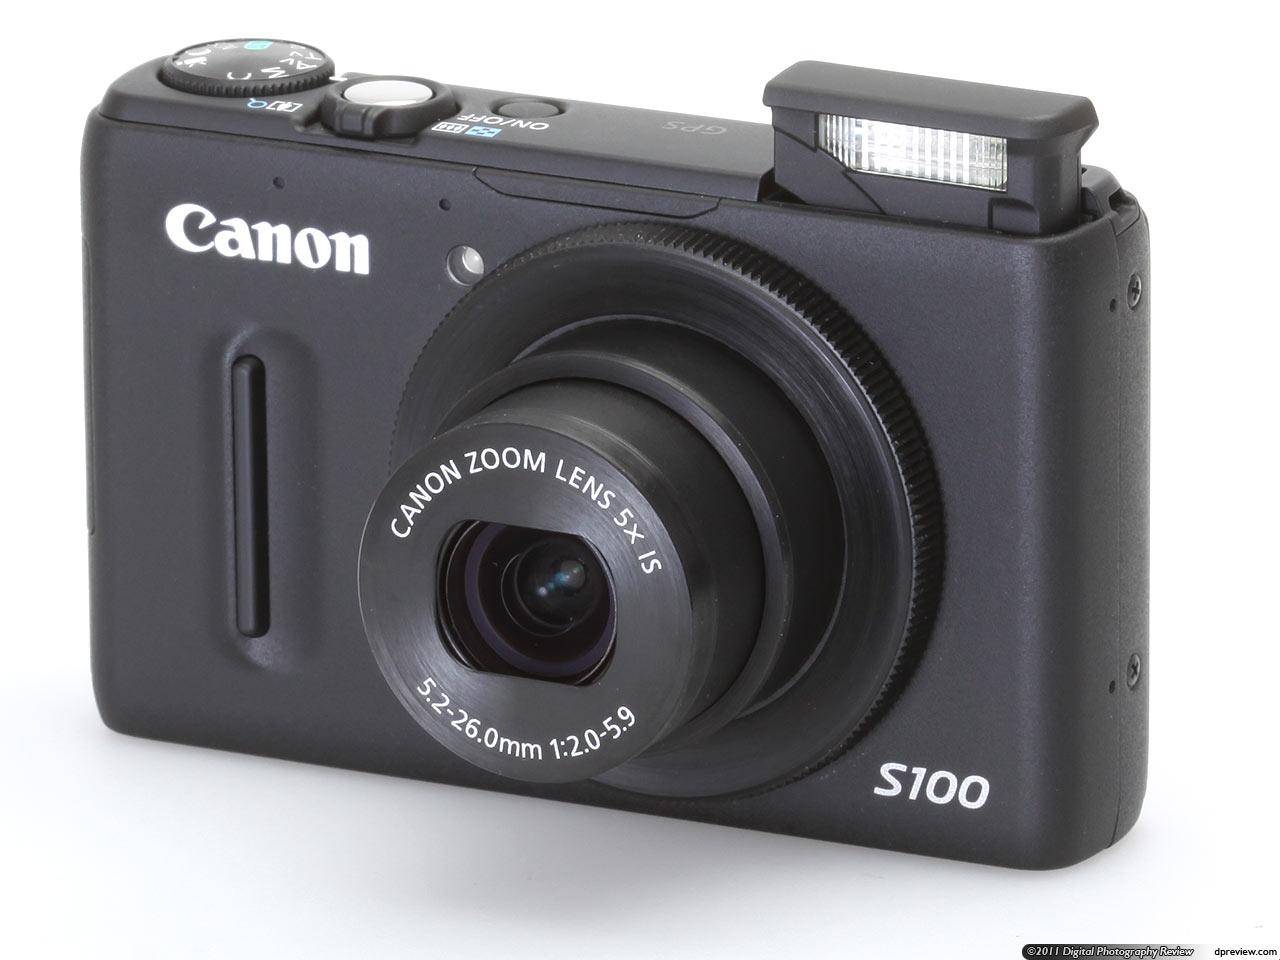 canon powershot s100 review digital photography review rh dpreview com Canon S150 canon powershot s100 user manual